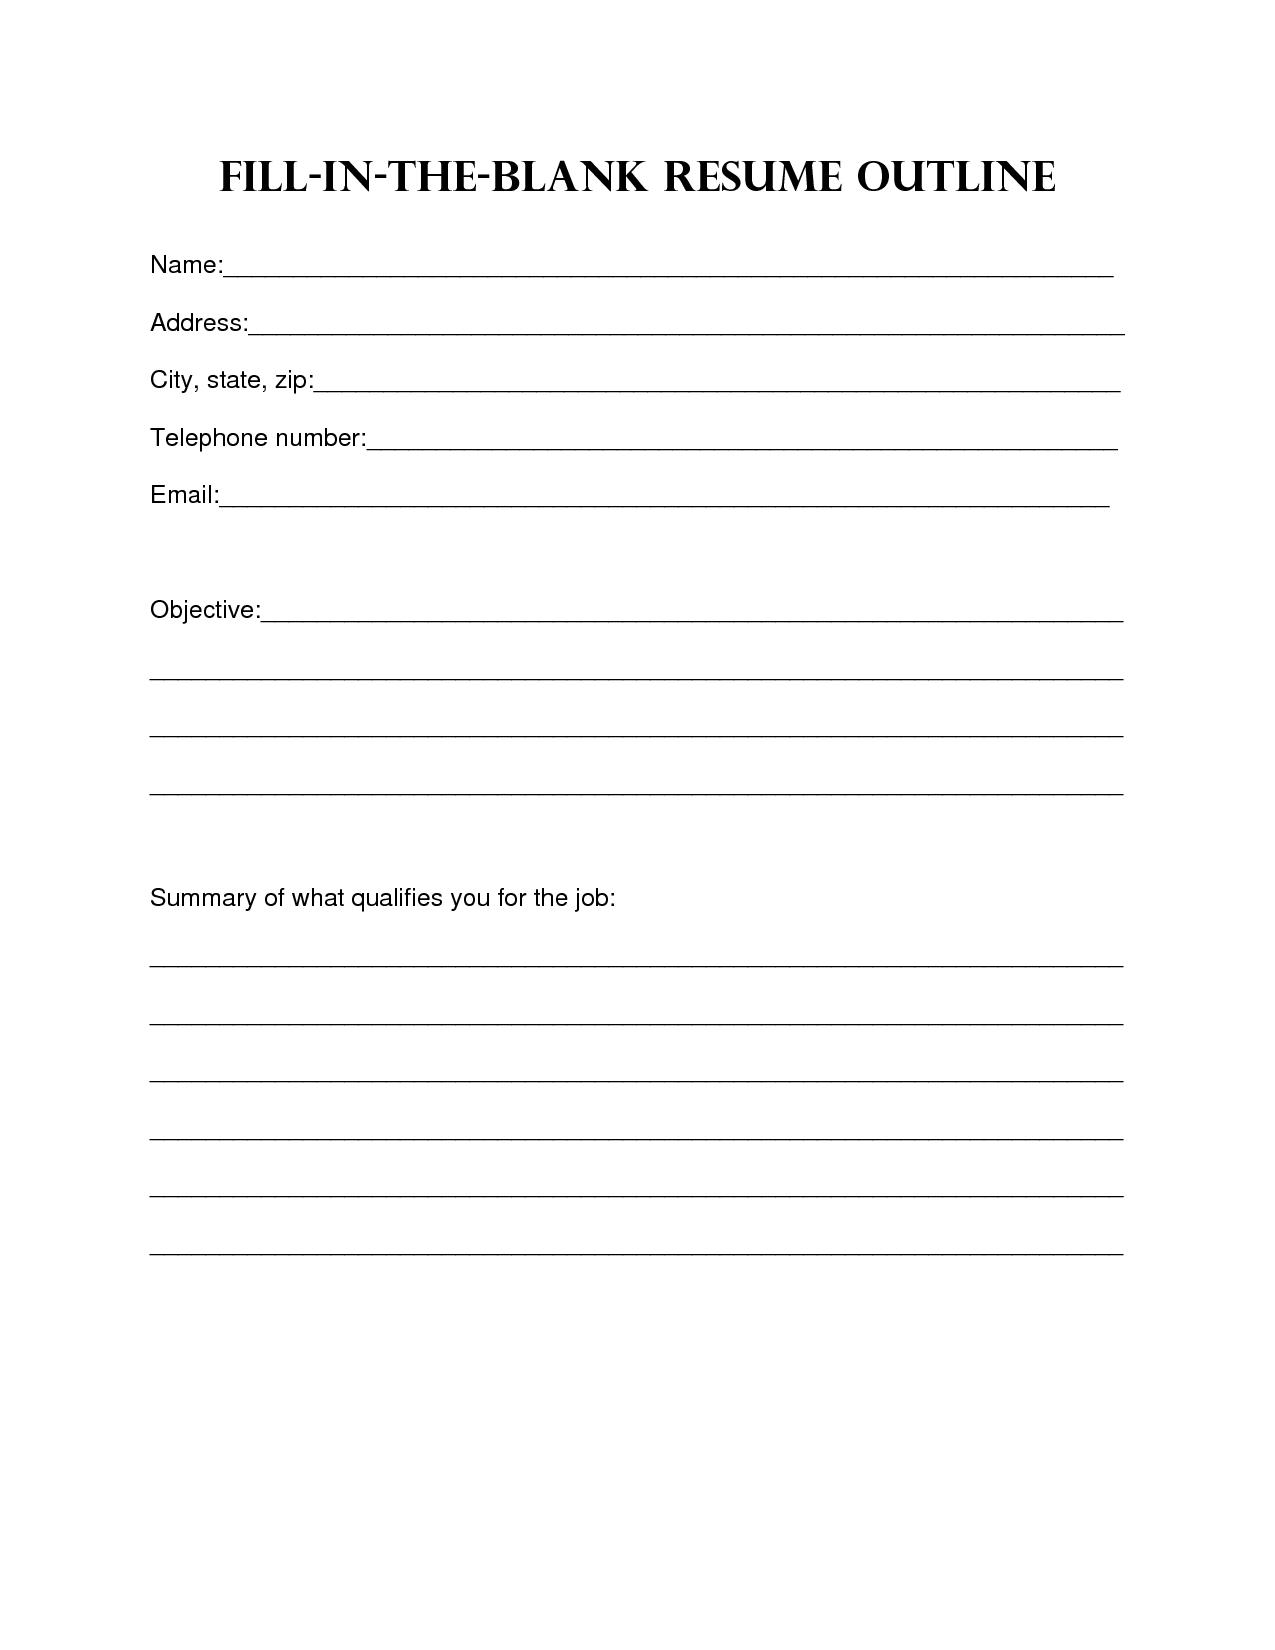 Pin Blank Resume Fill In PDF httpwwwresumecareerinfopin